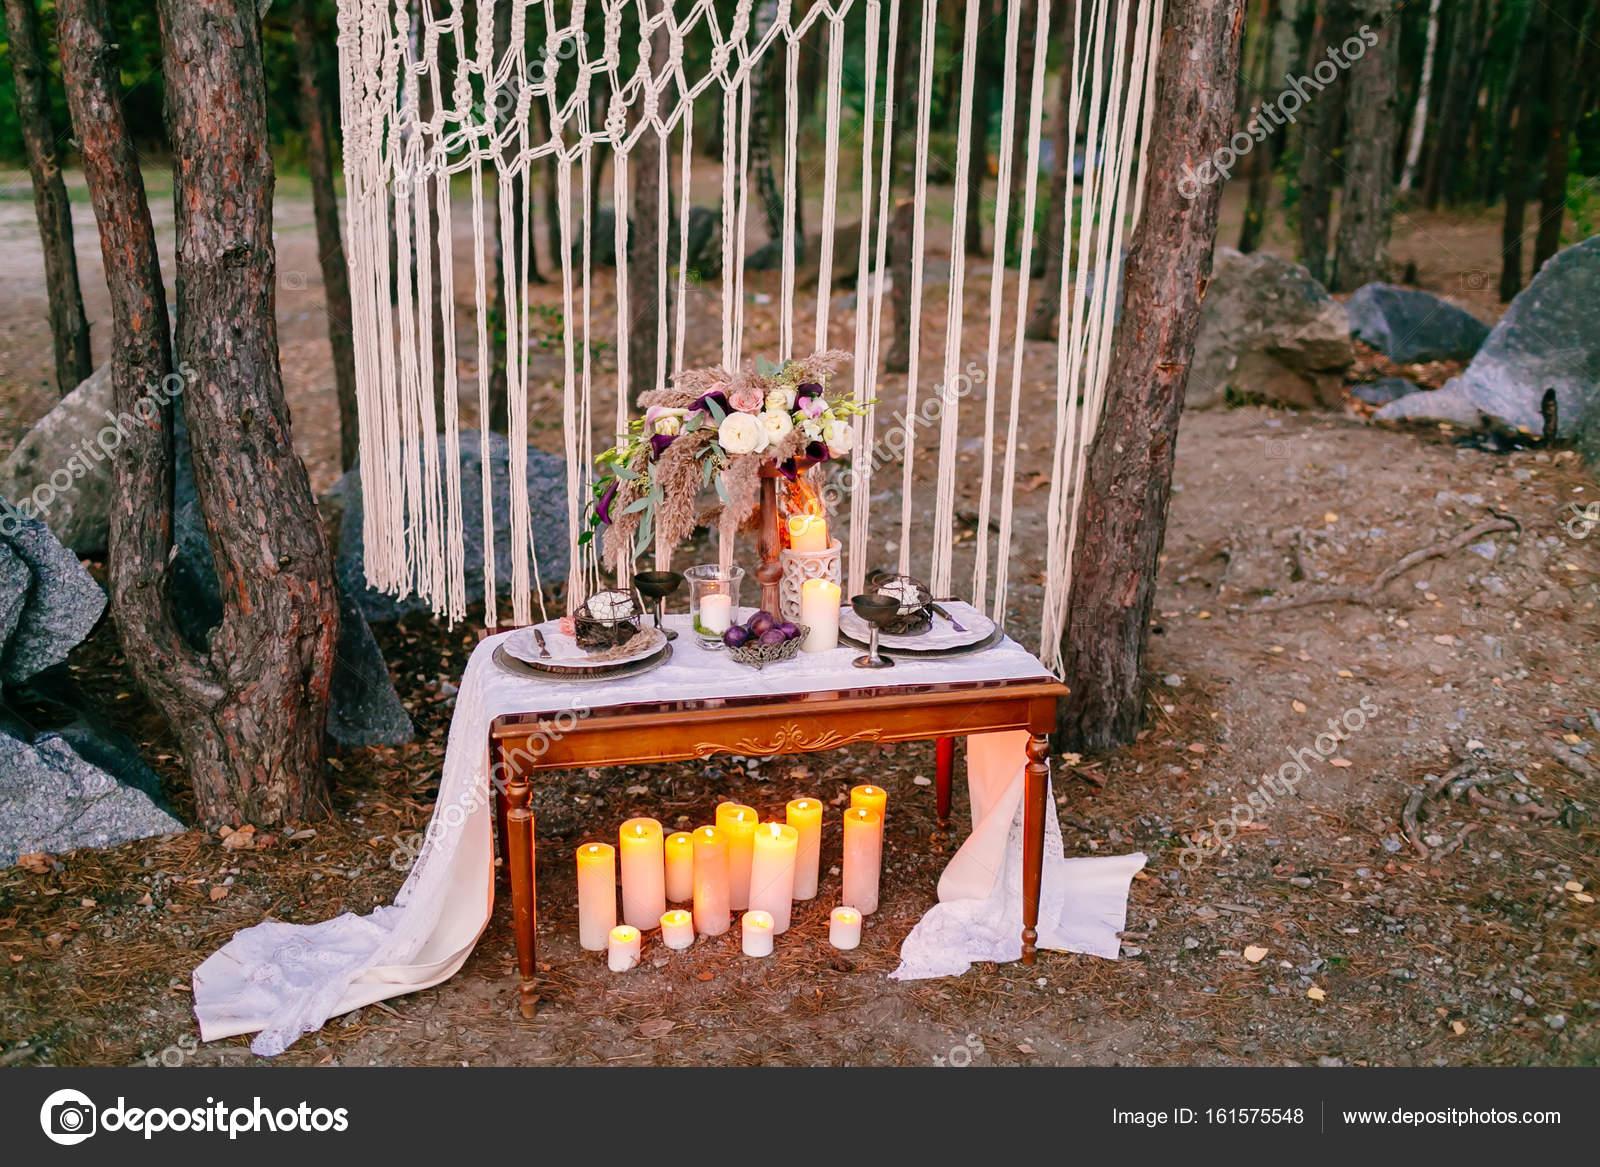 Svatebni Dekorace V Rustikalnim Stylu Vylet Obrad Svatba V Prirode